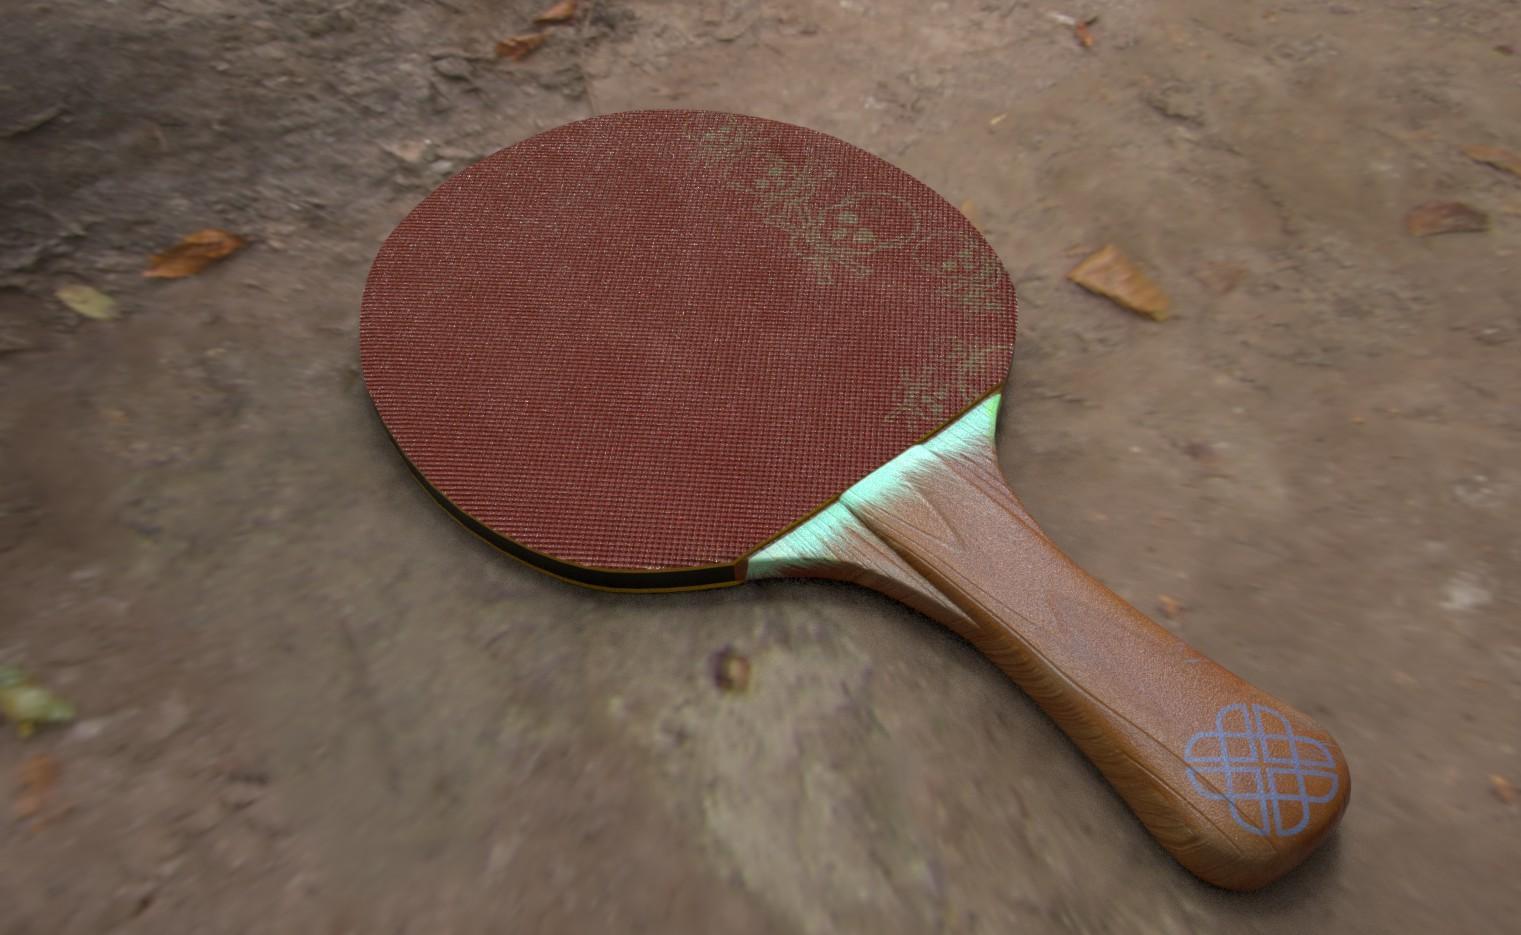 Carl vazquez pingpong5